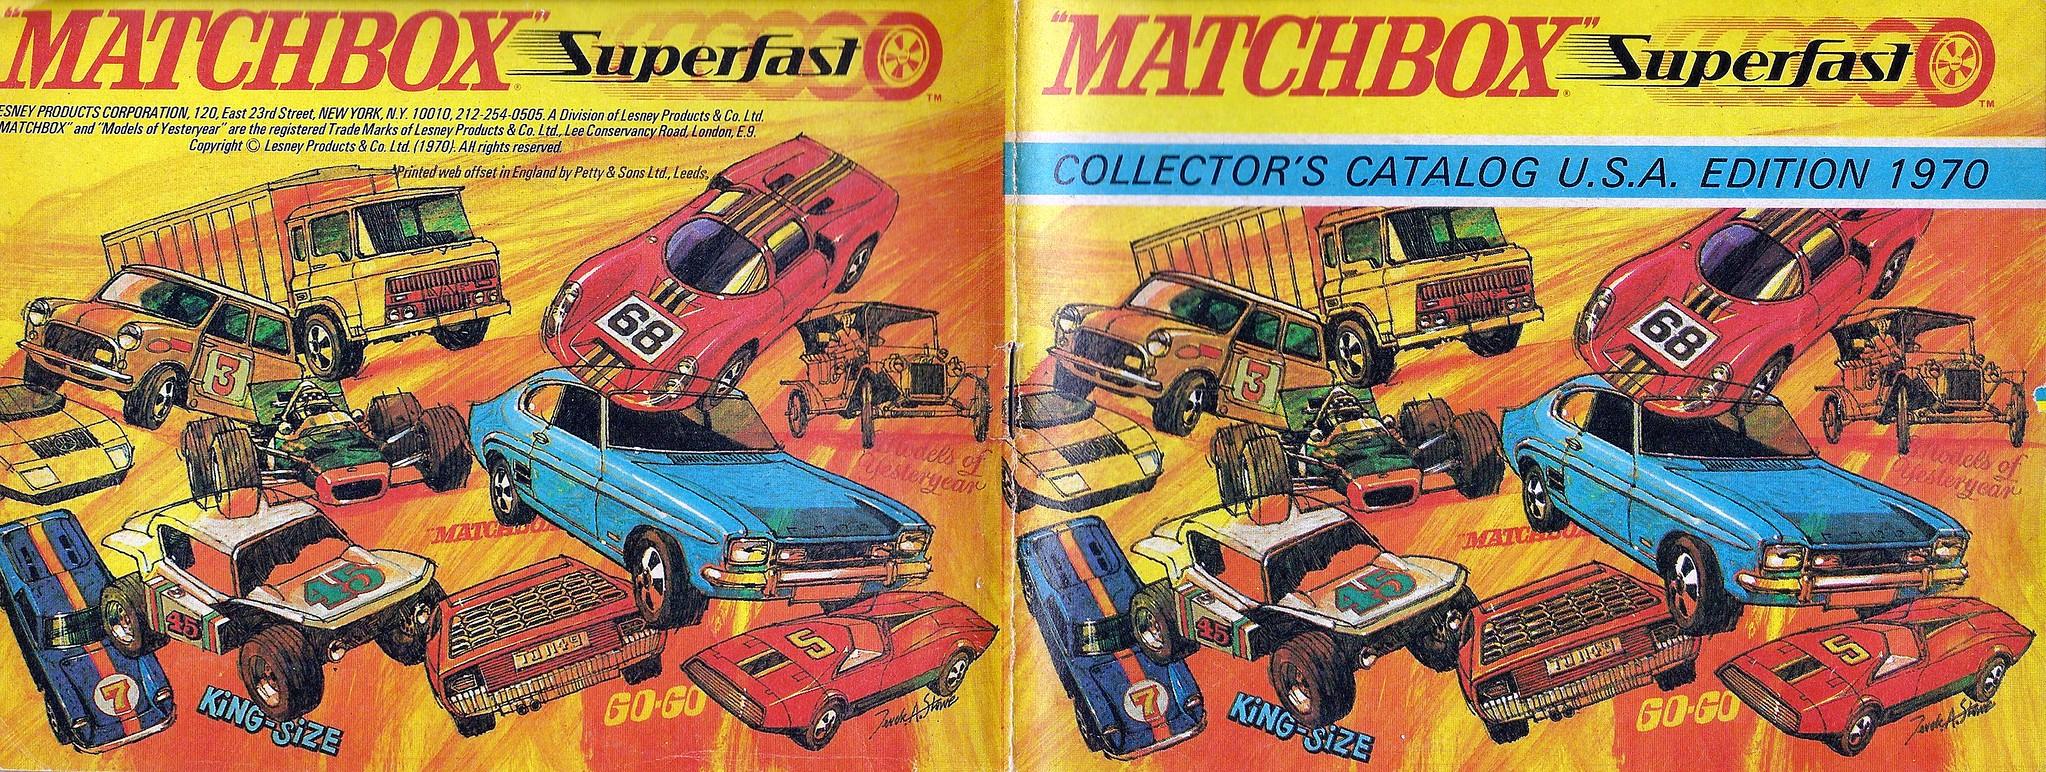 Matchbox 1970 Collector's Catalogue | Flickr